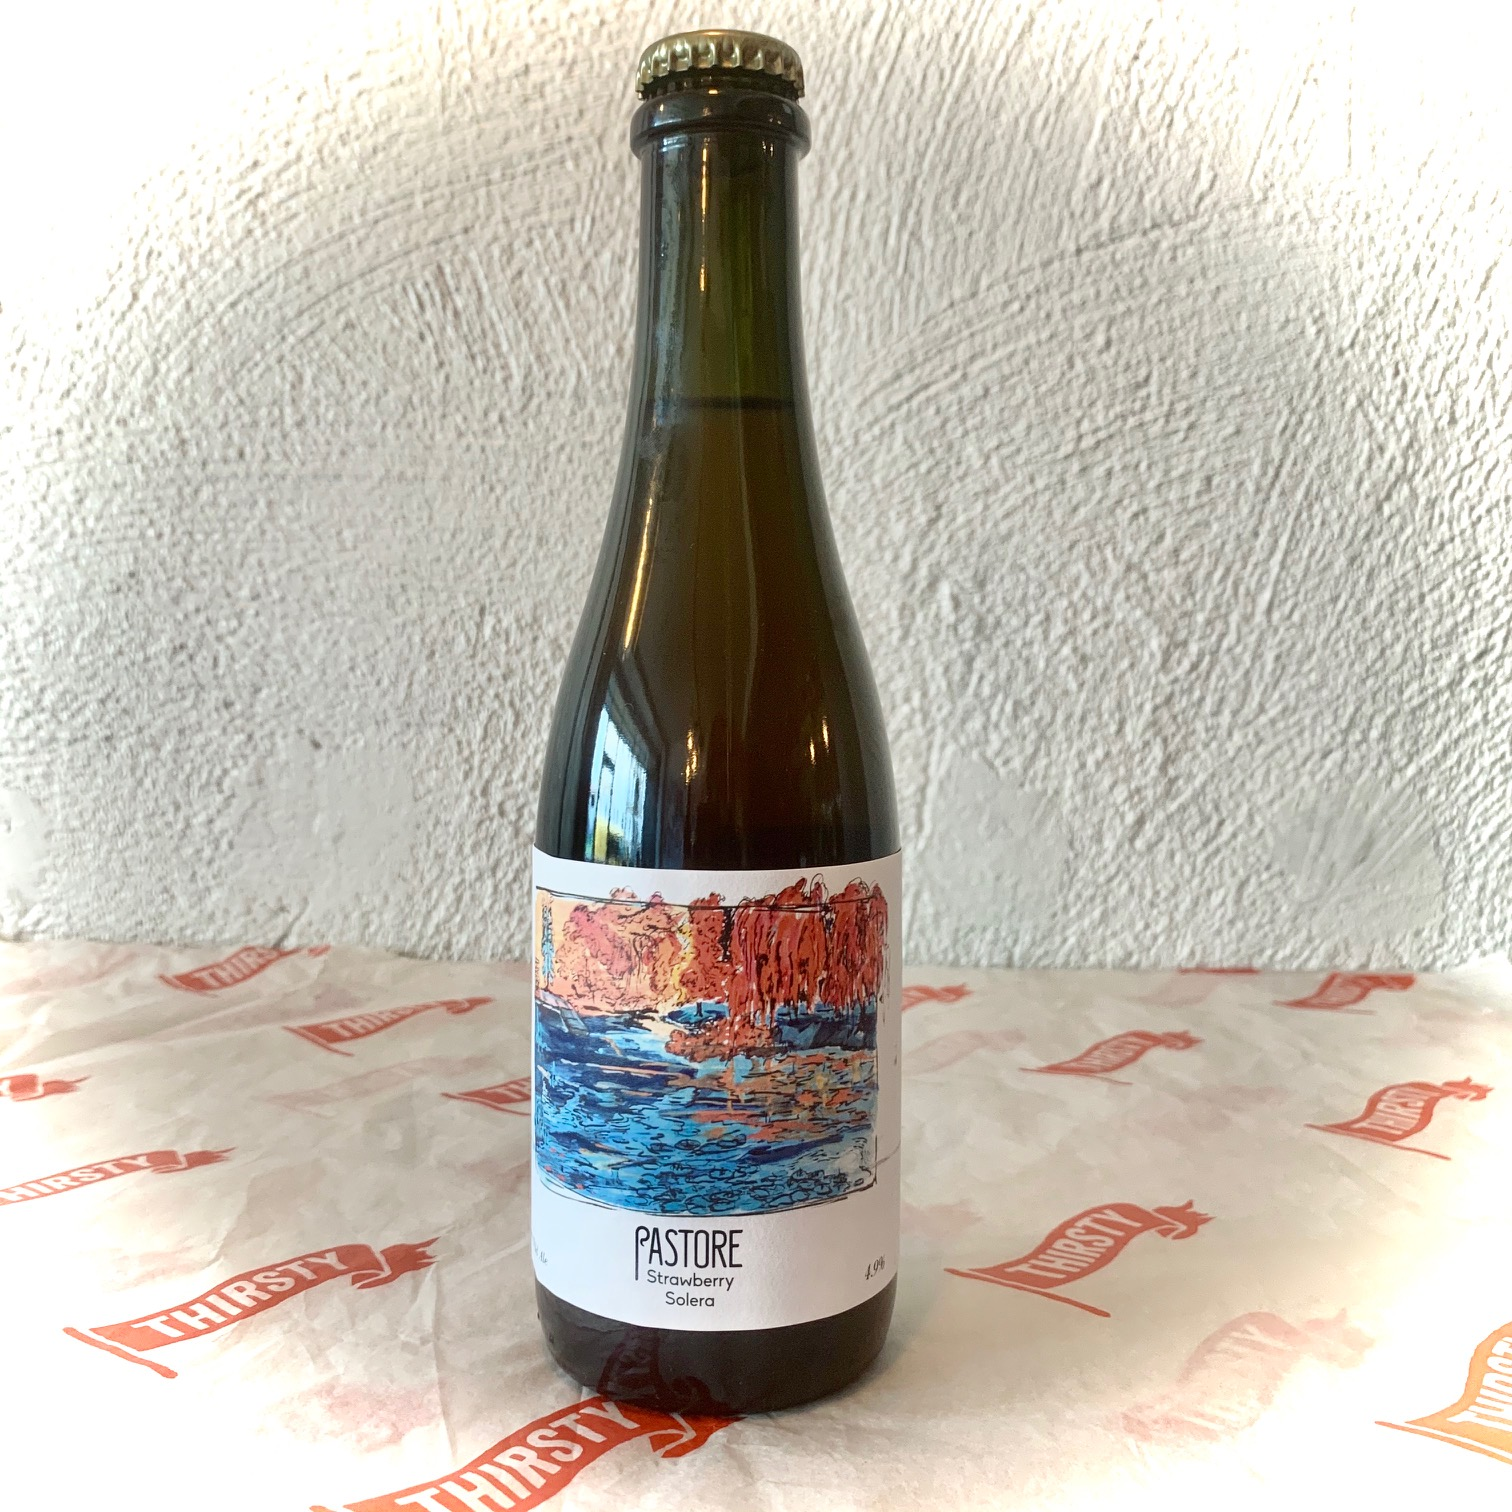 Pastore | Strawberry Solera | Wild Ale with Suffolk Strawberries 4.9% 375ml